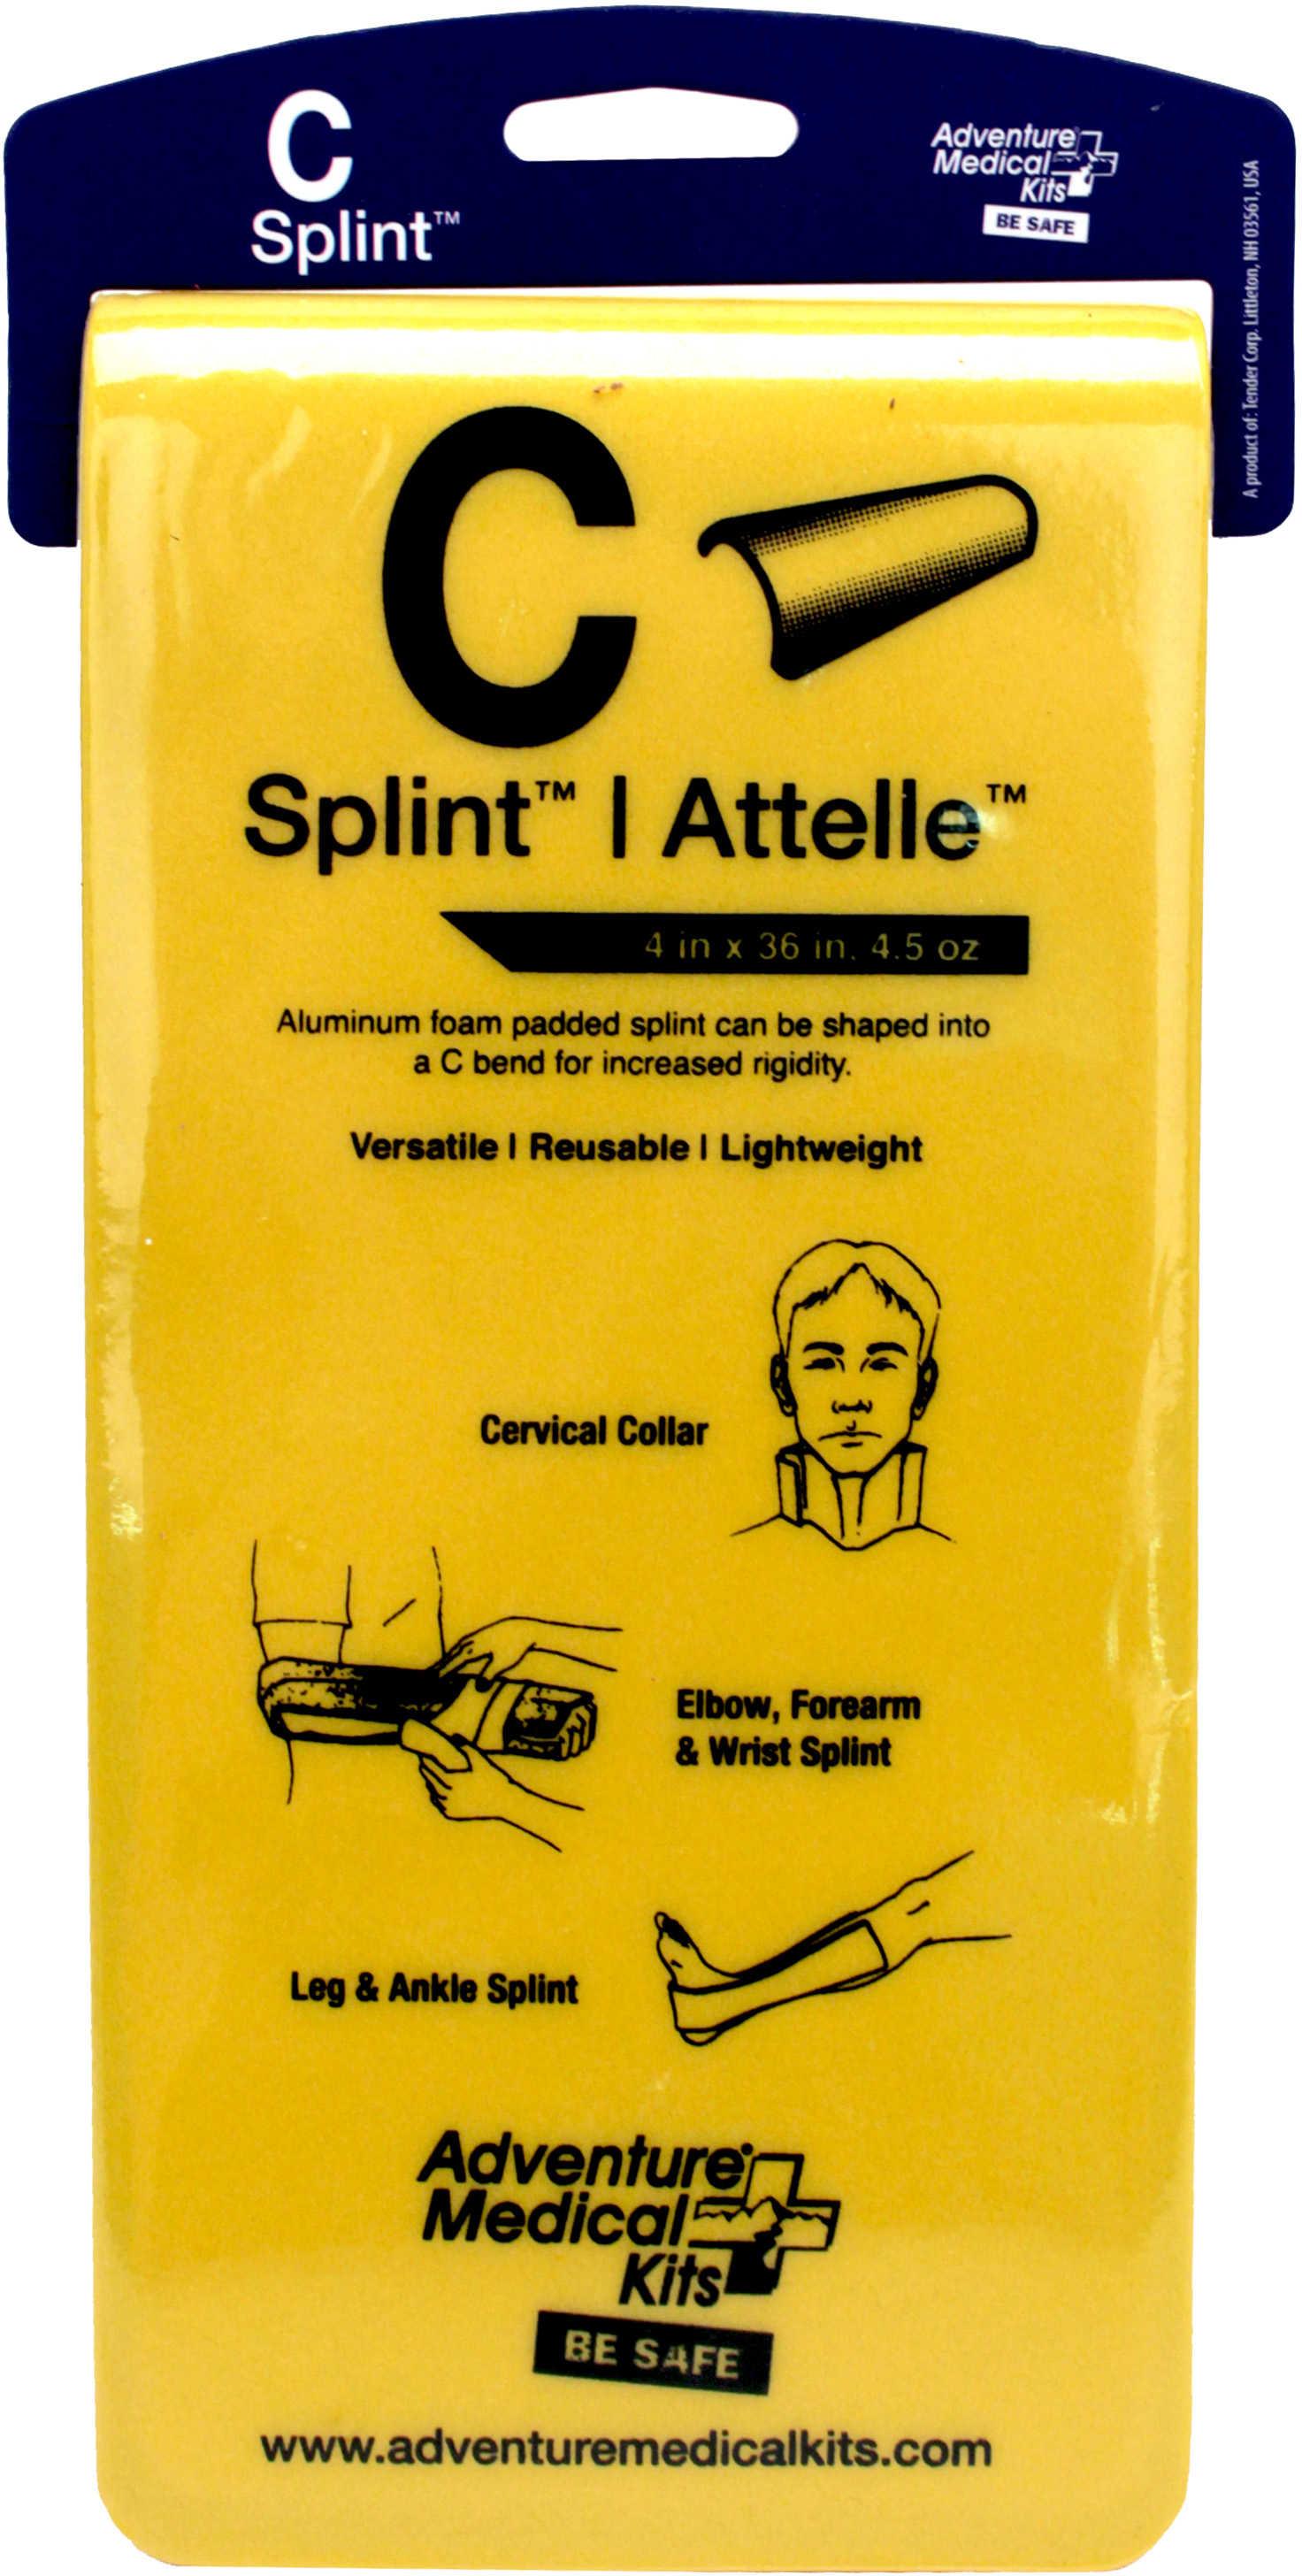 Adventure Medical Kits / Tender Corp Adventure Medical AMK C-Splint 7010-0402